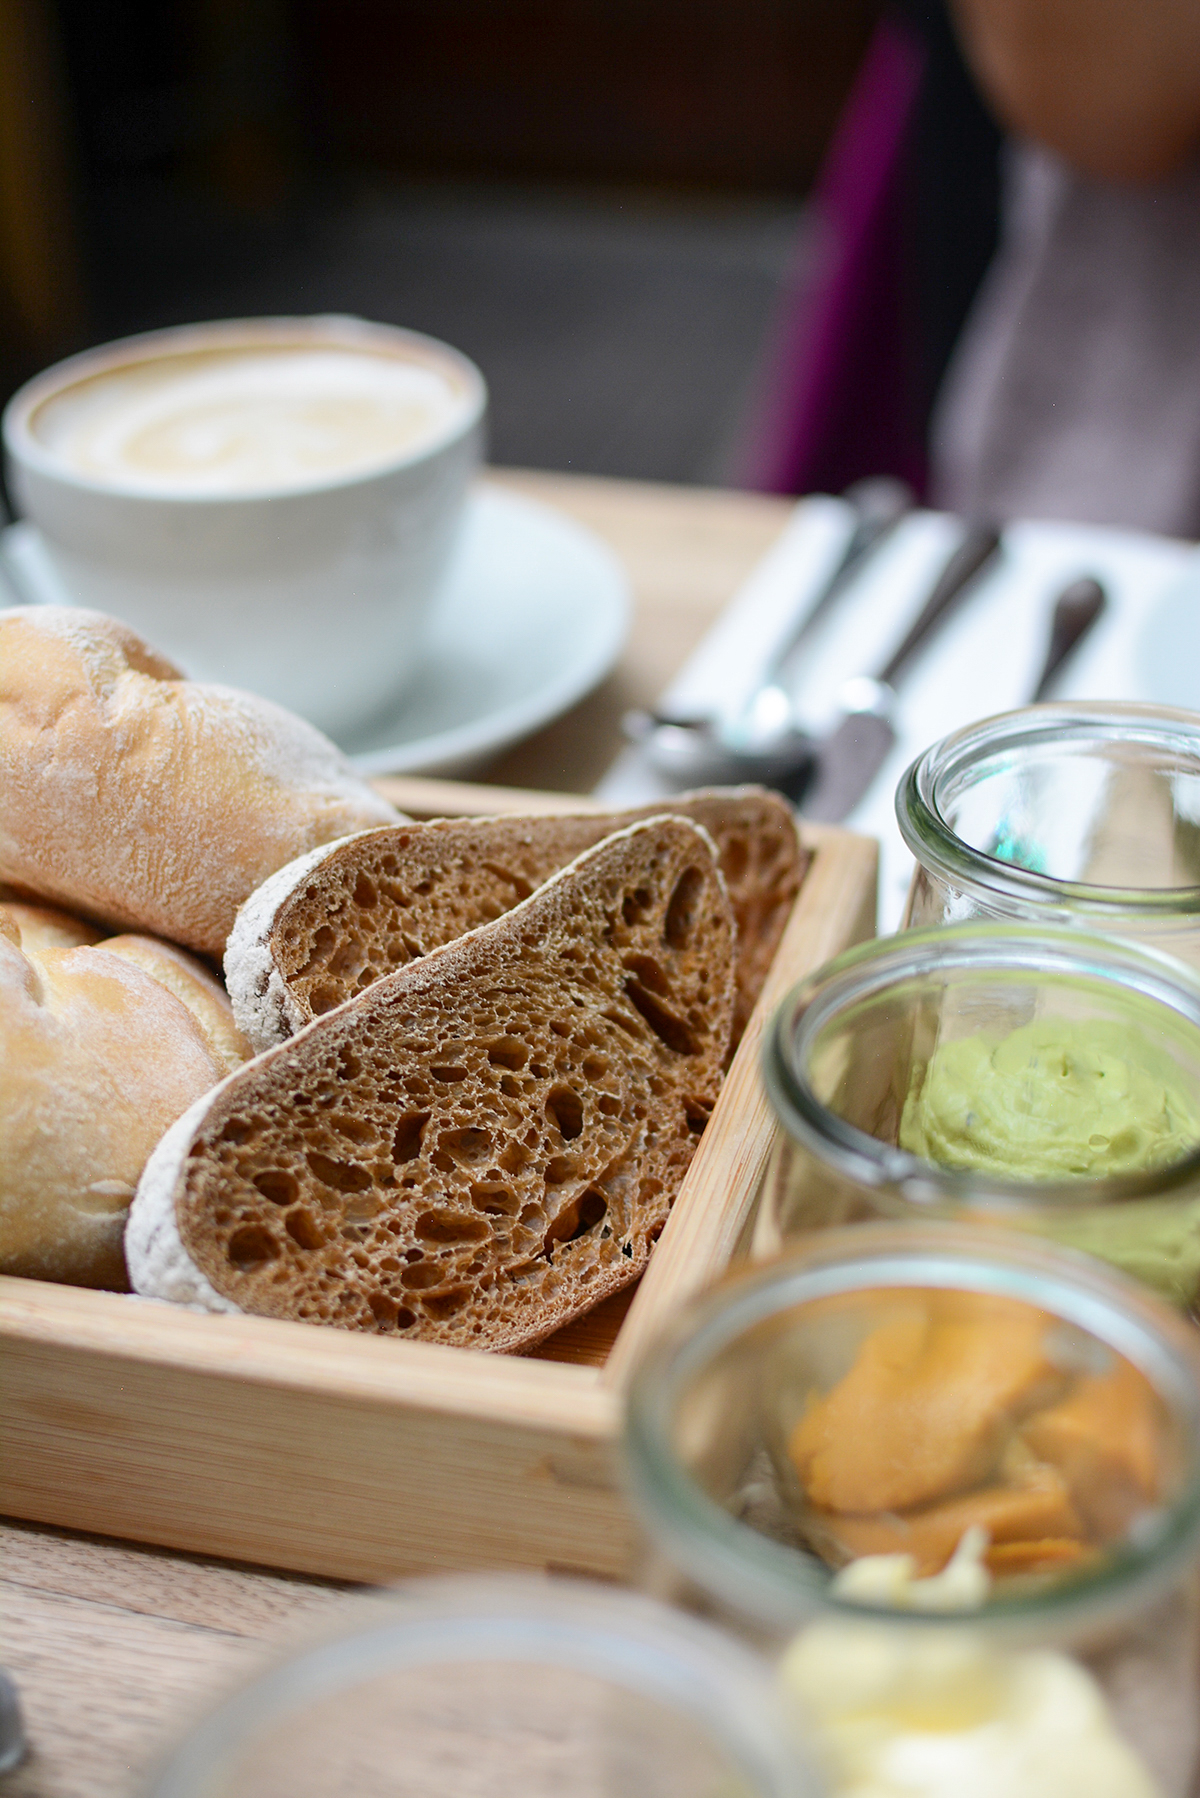 Tian Frühstück | Pixi mit Milch